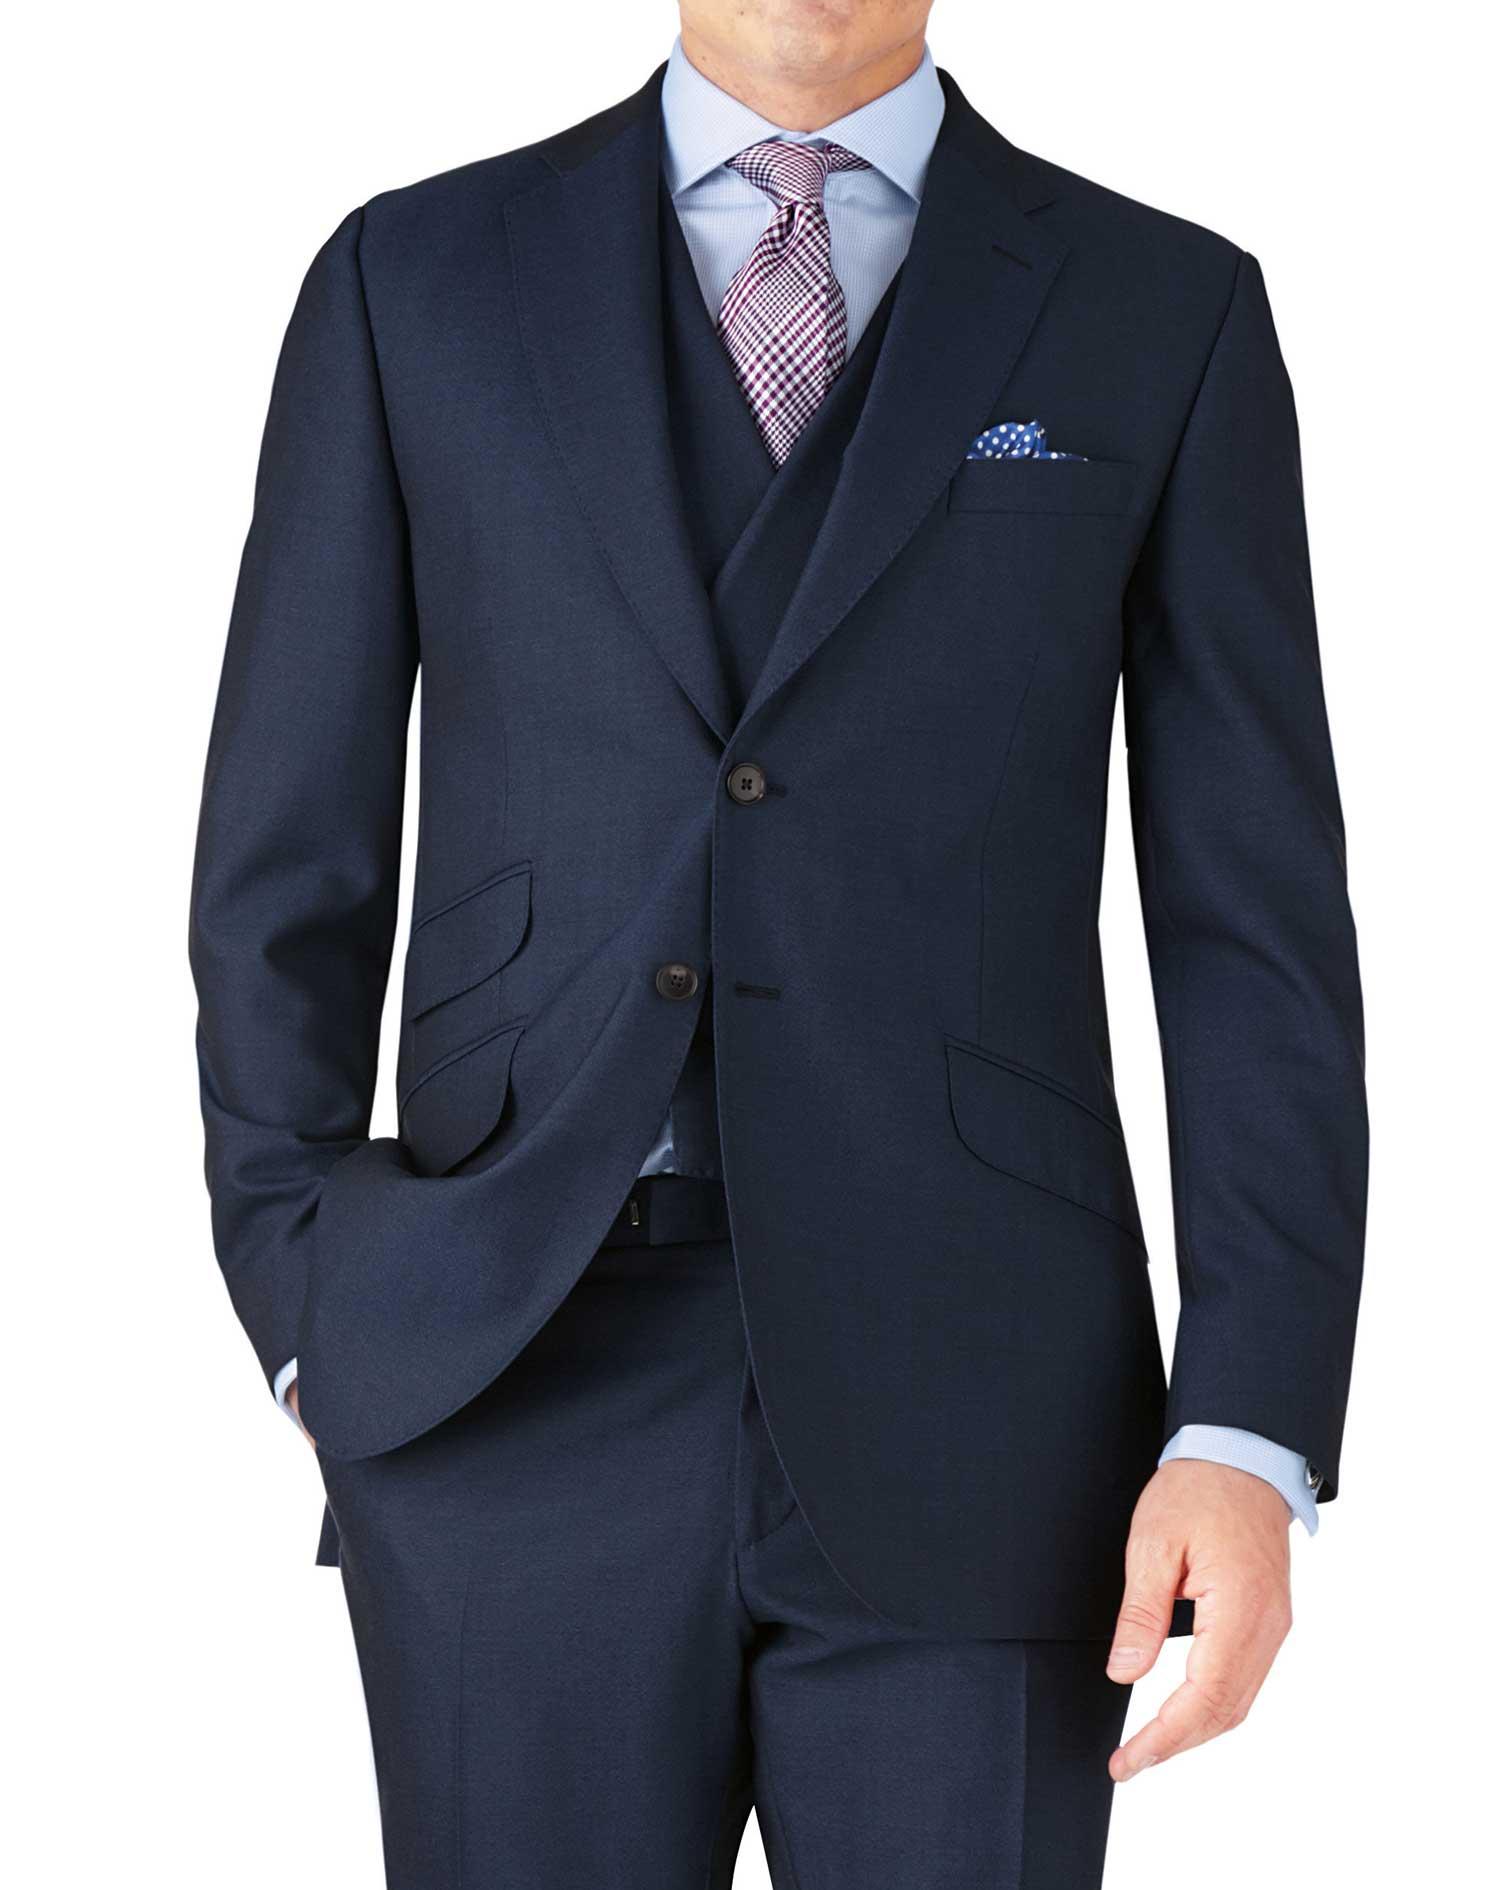 Blue Classic Fit British Panama Luxury Suit Wool Jacket Size 46 Long by Charles Tyrwhitt